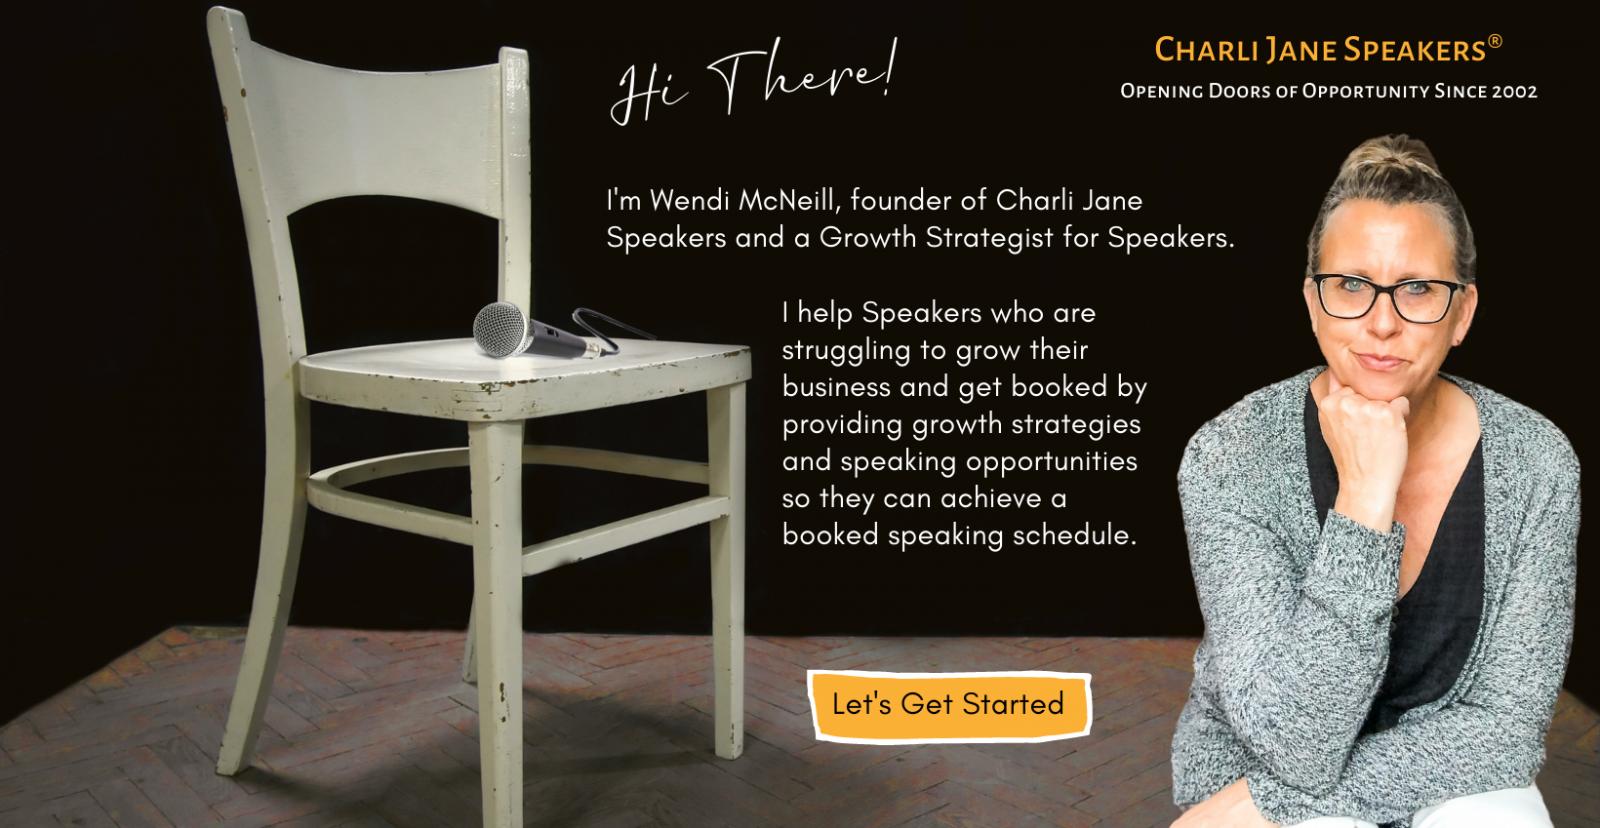 Chari Jane Speakers